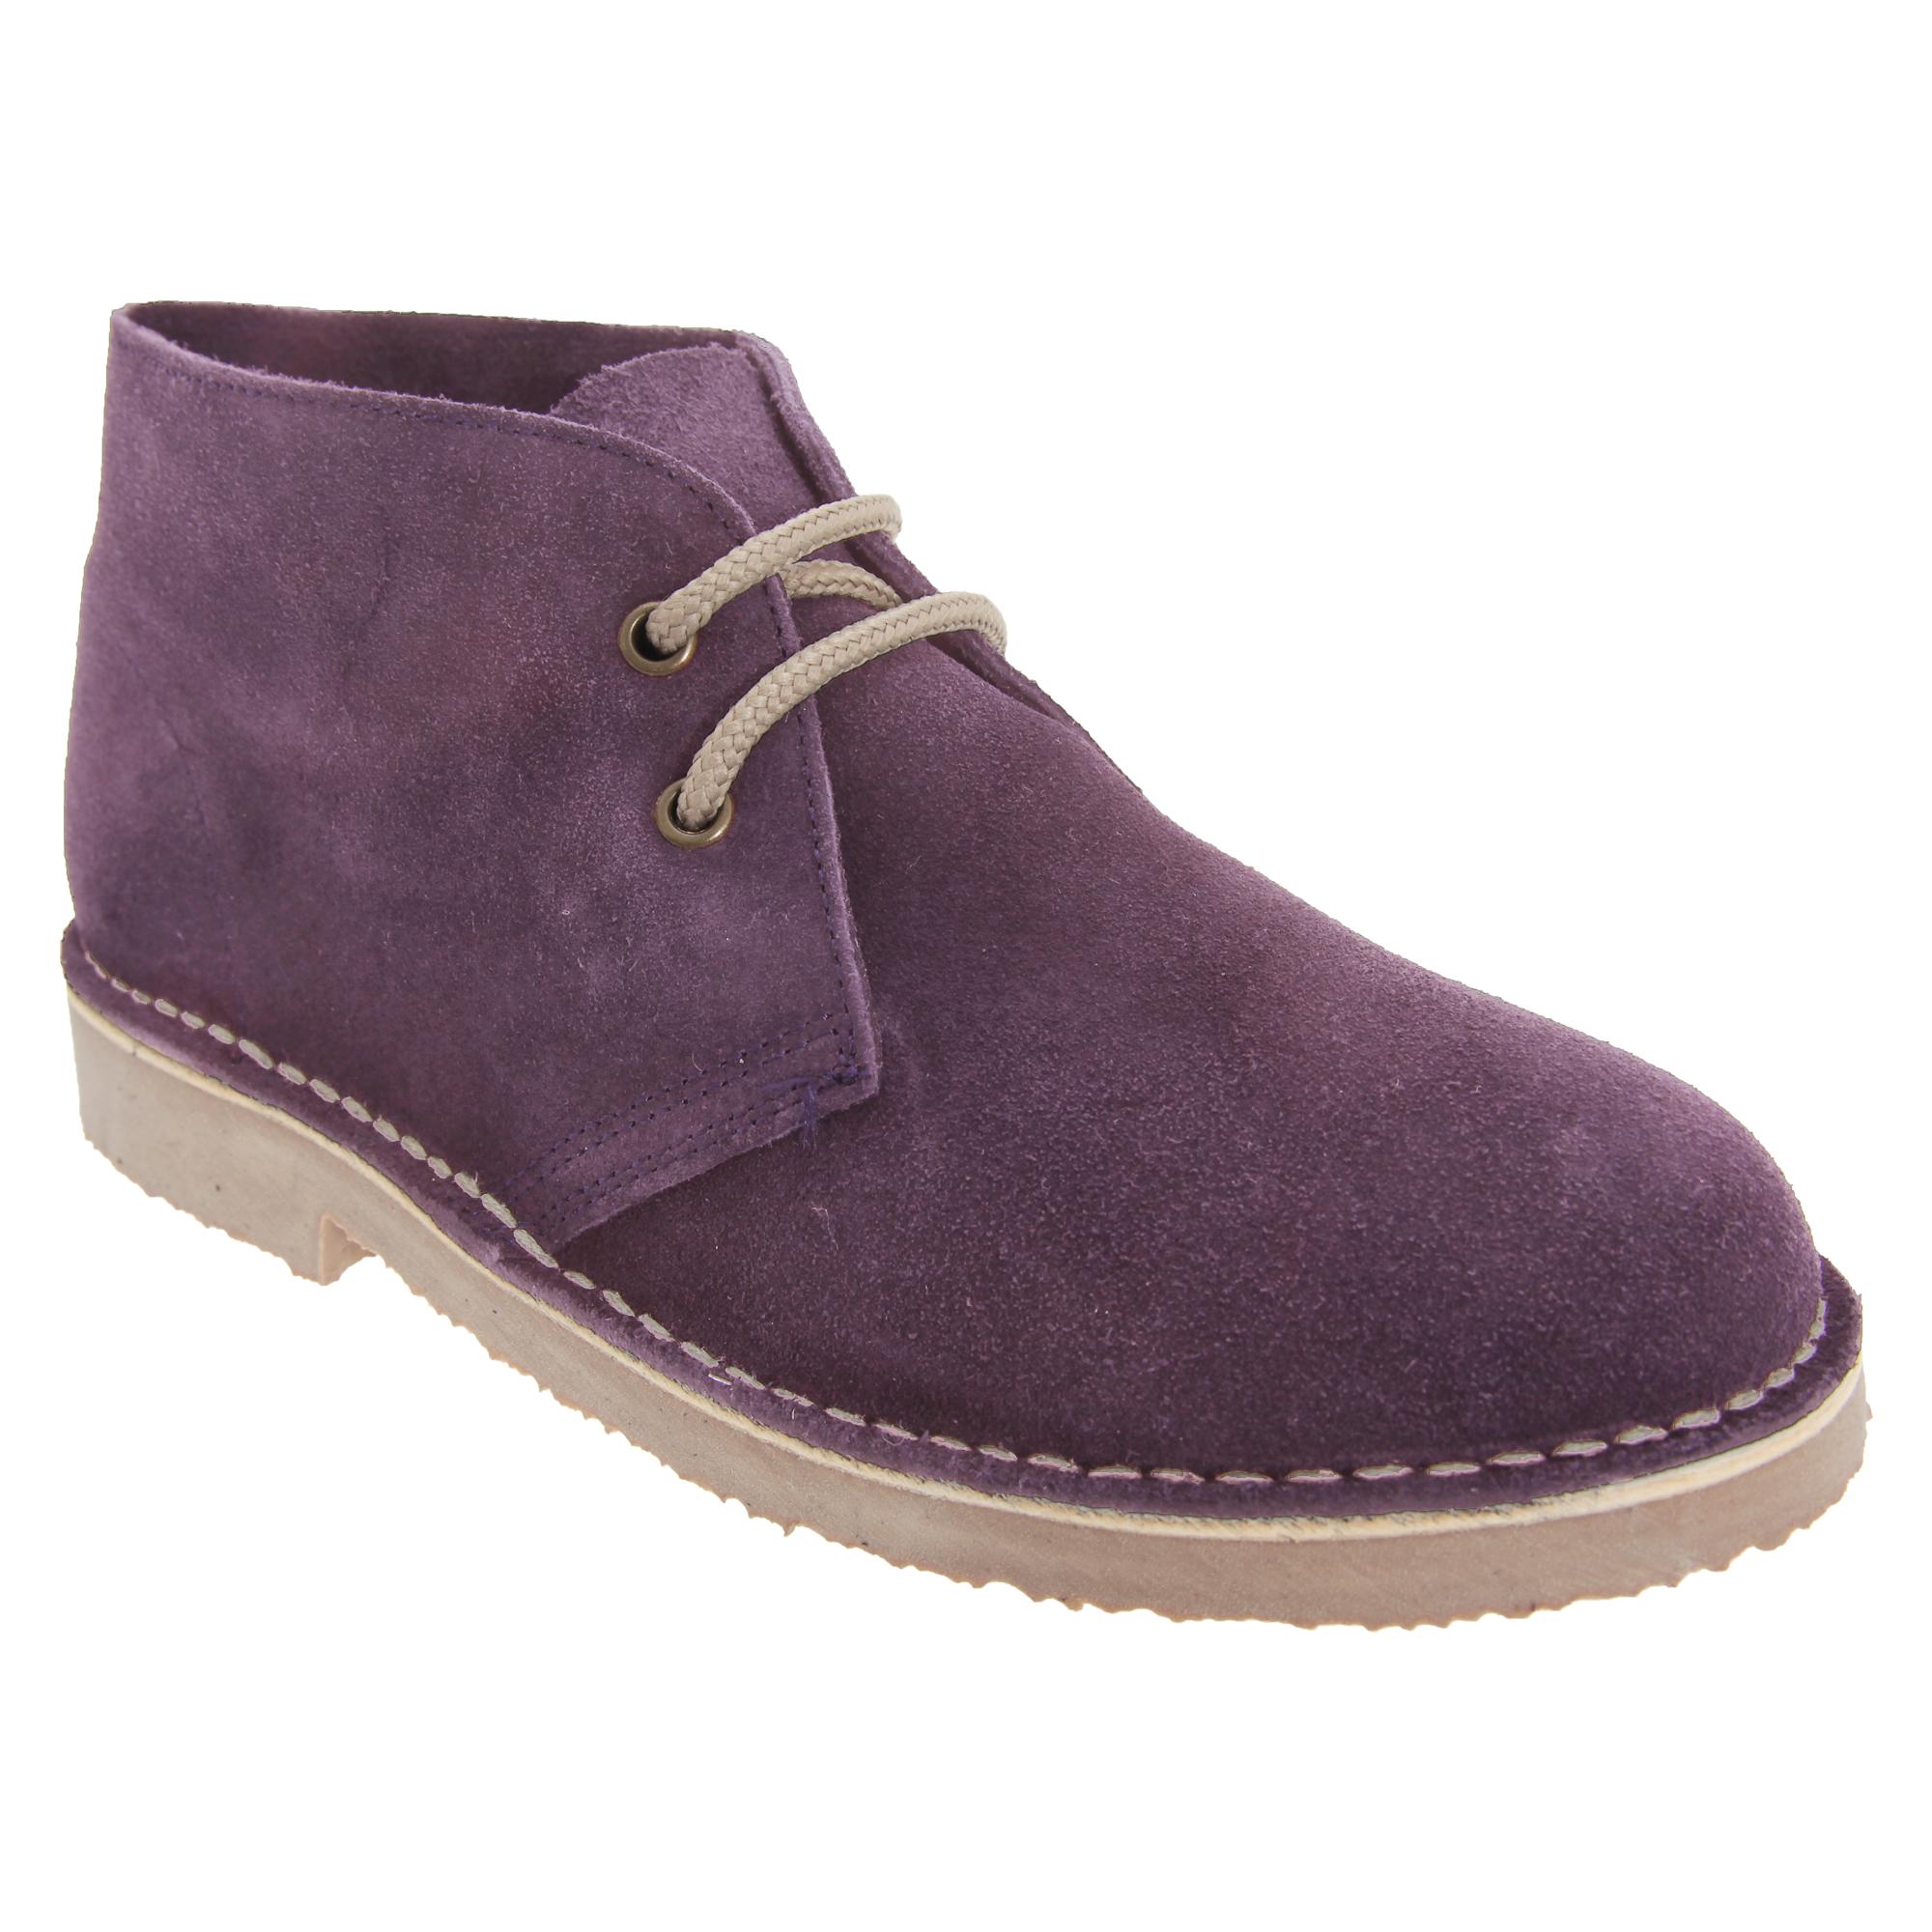 Roamers Adults Unisex Real Suede Unlined Desert Boots (15 UK) (Dark Grey)